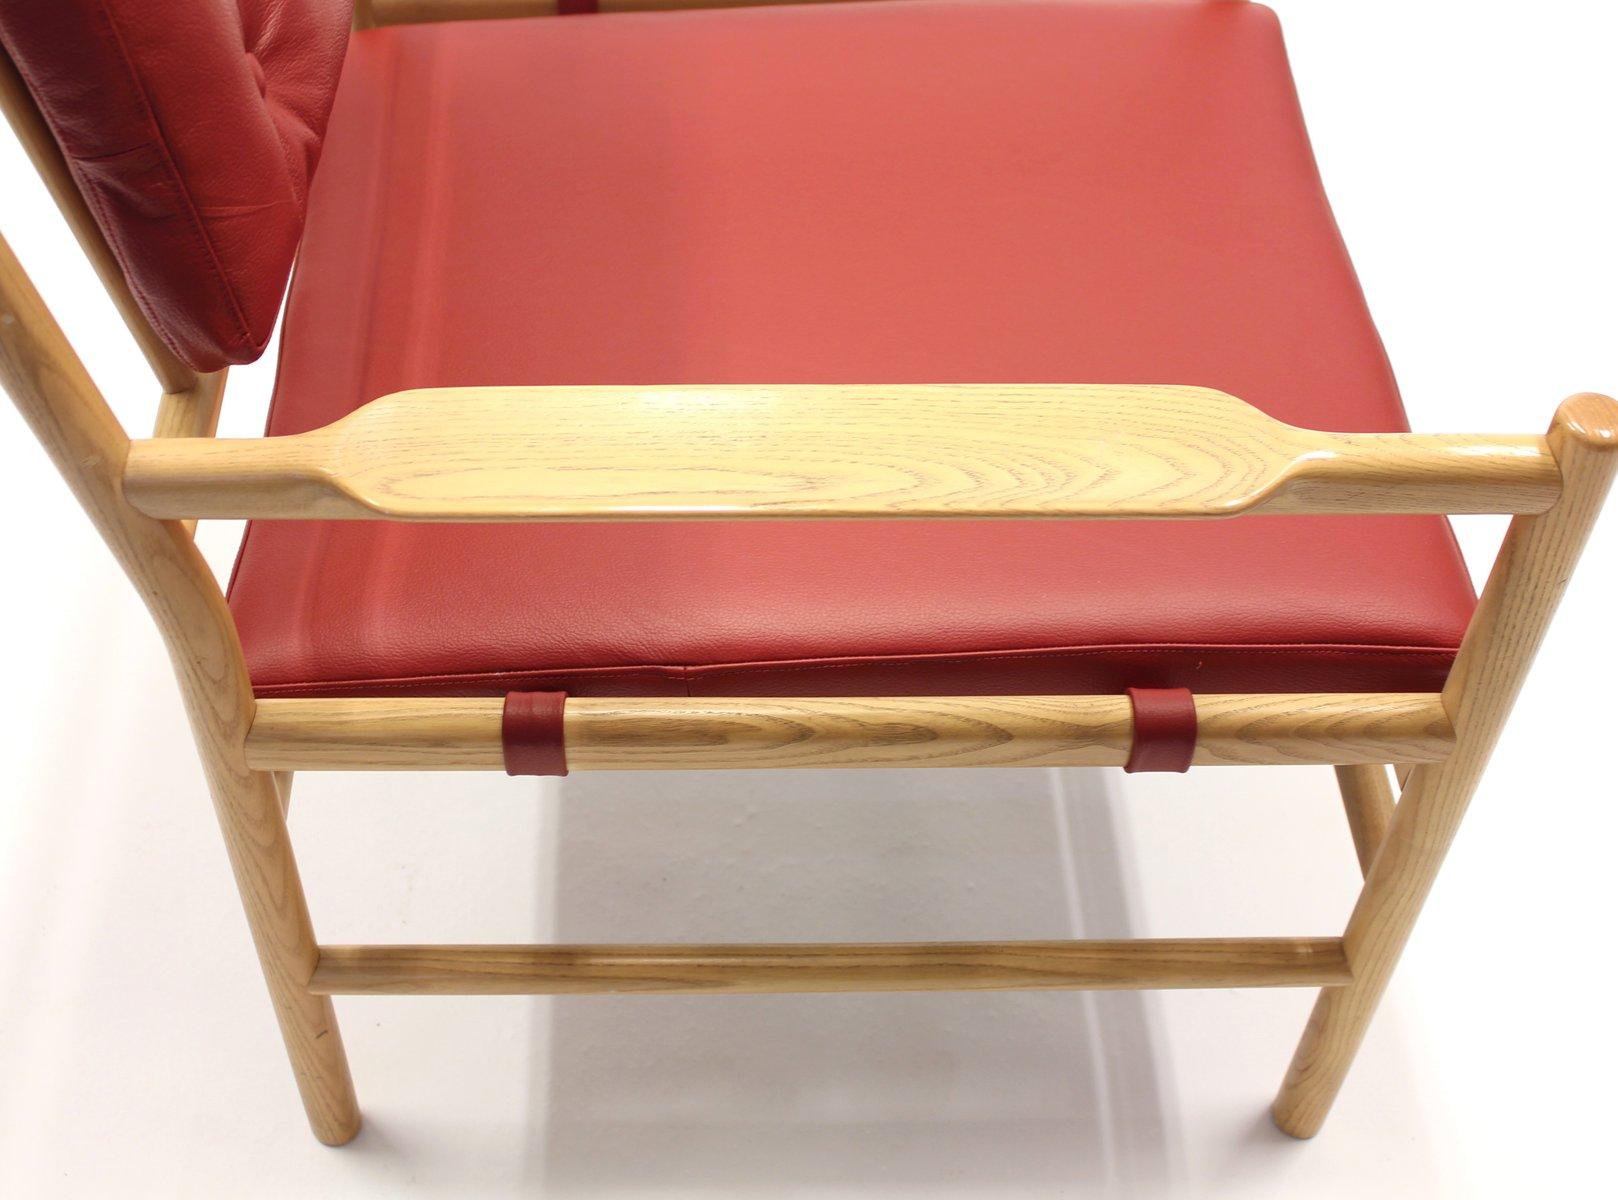 safari style furniture. Price Per Piece Safari Style Furniture